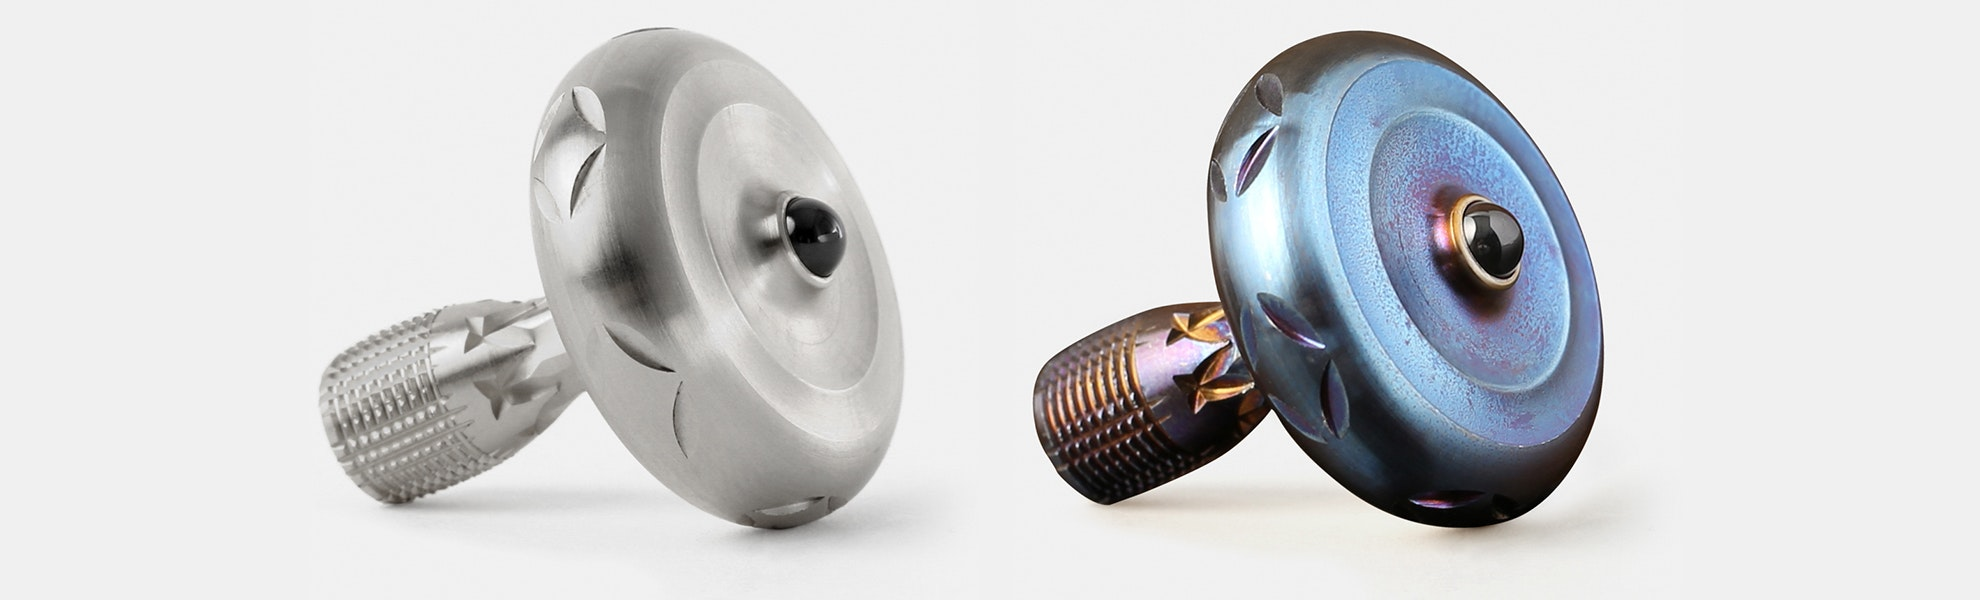 "Spun Out Designs ""Sceptre"" Spinning Top"